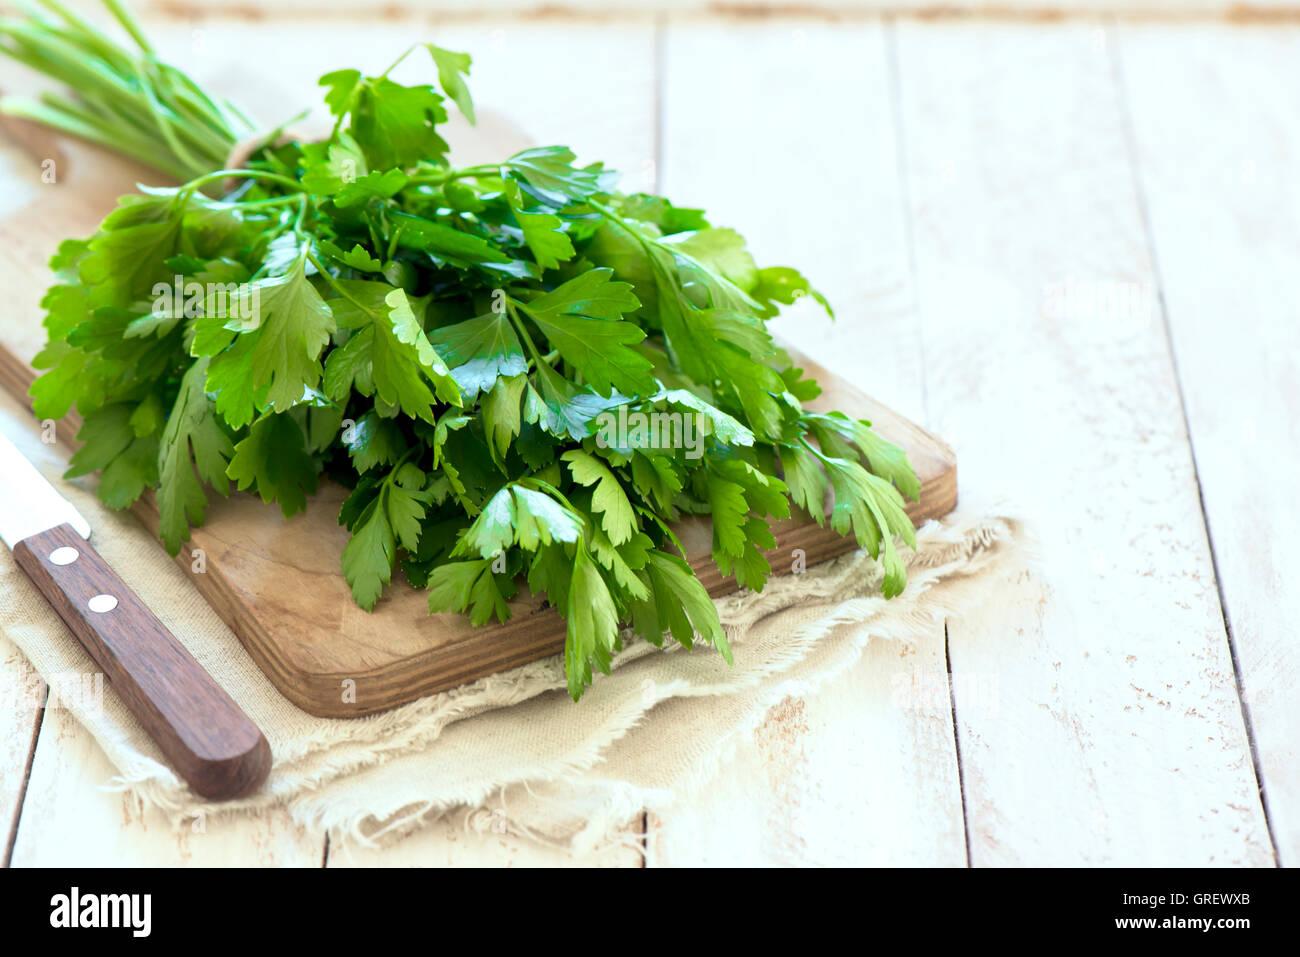 Organic italian parsley closeup on rustic wooden table, healthy vegetarian food - Stock Image